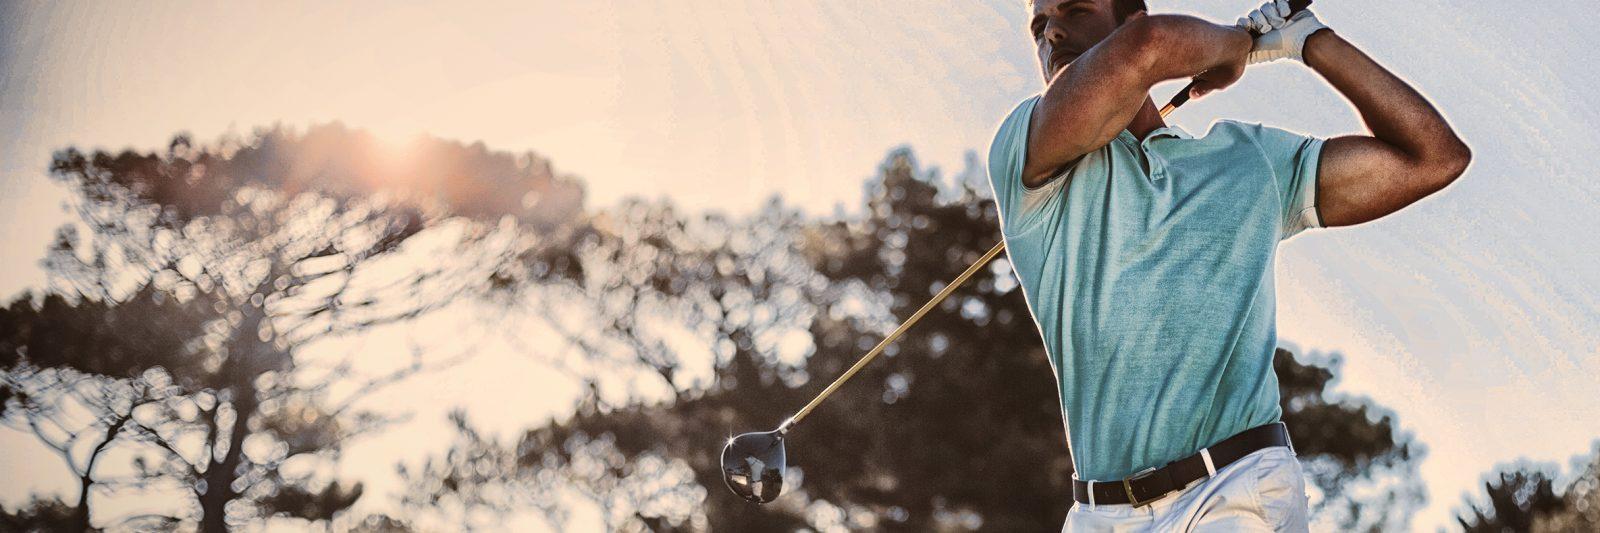 TrueScore Golf